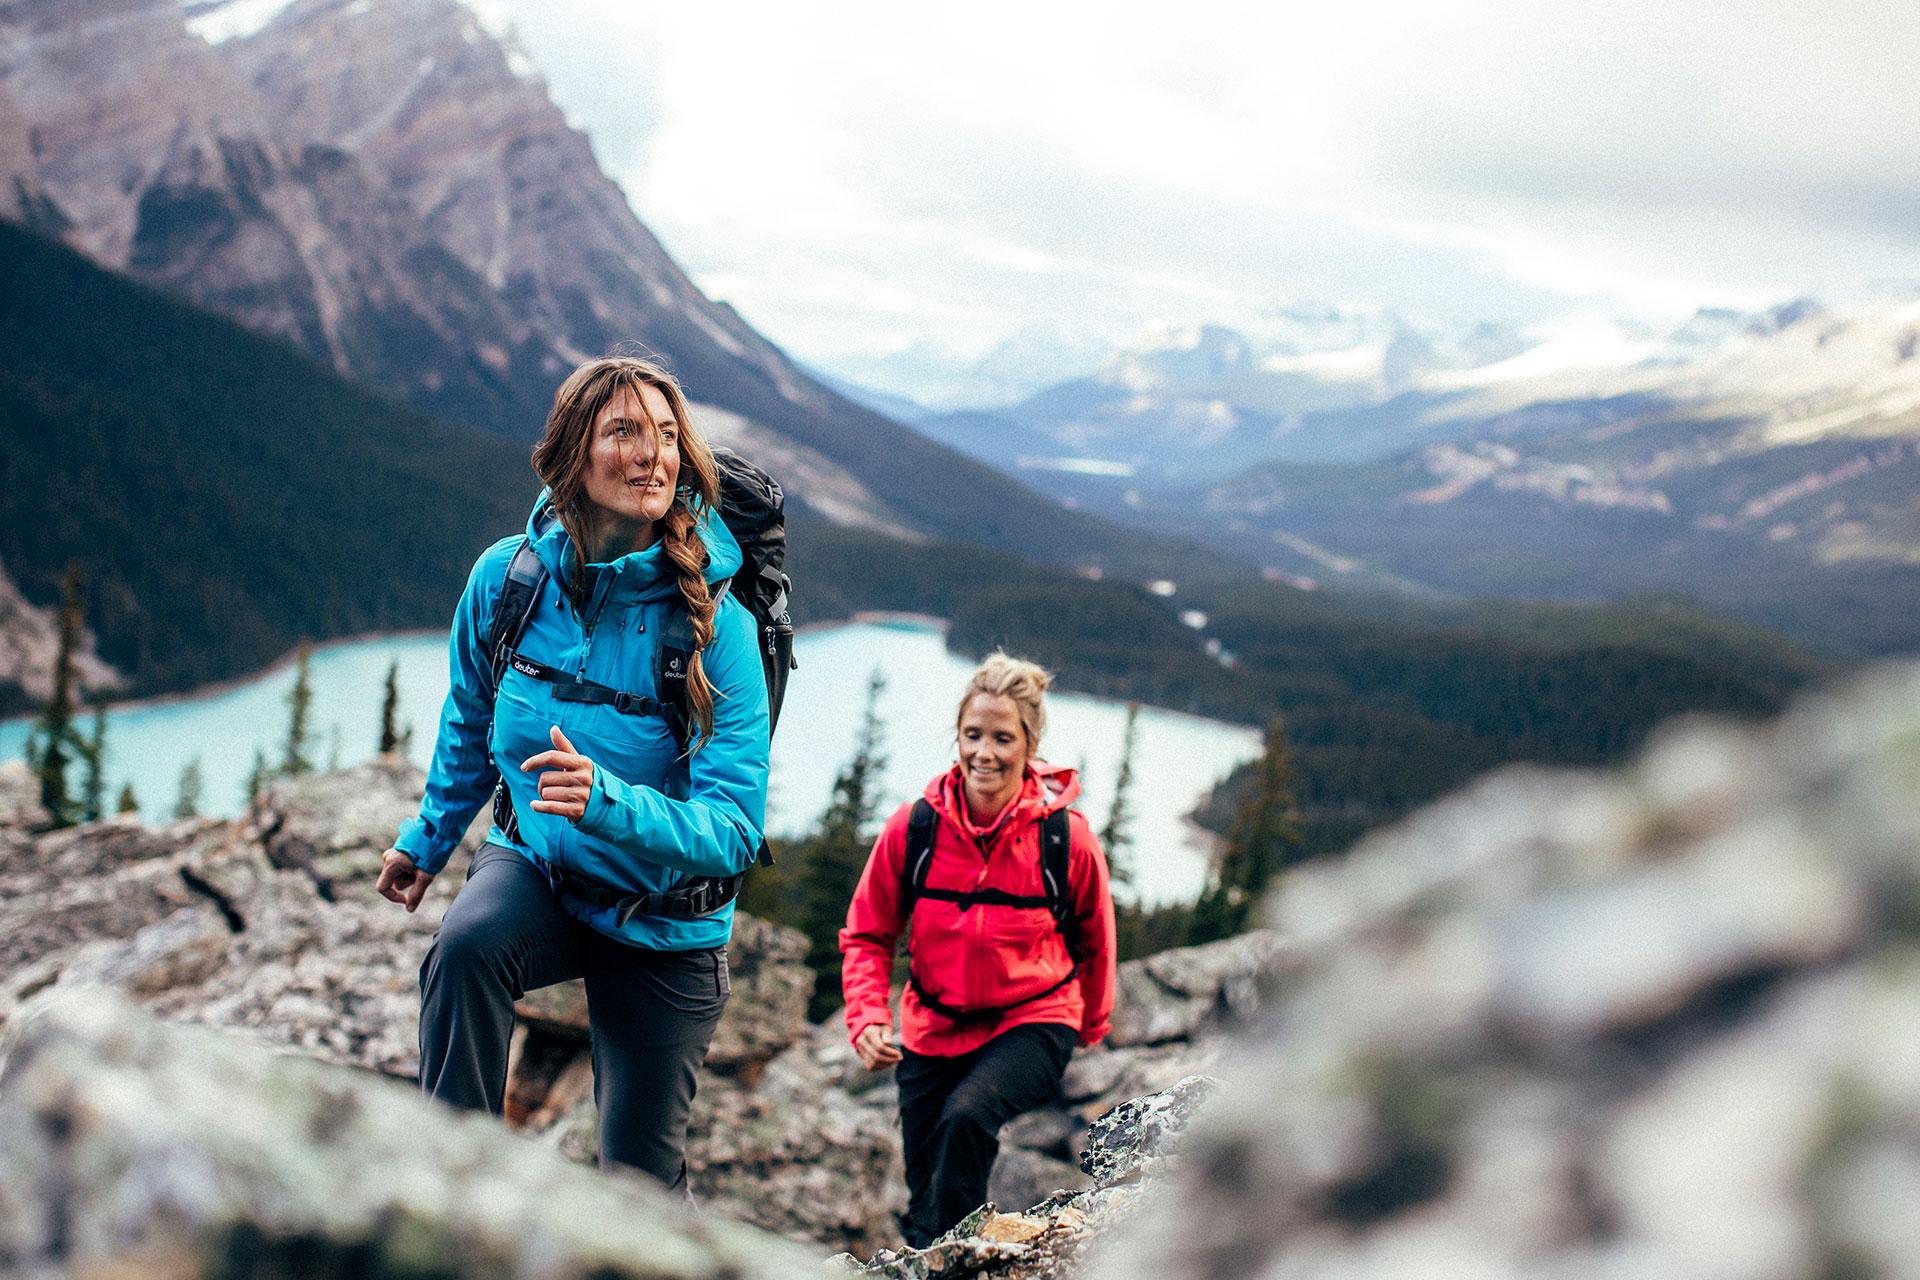 sport fotograf outdoor wandern trekking hiking rocky mountains